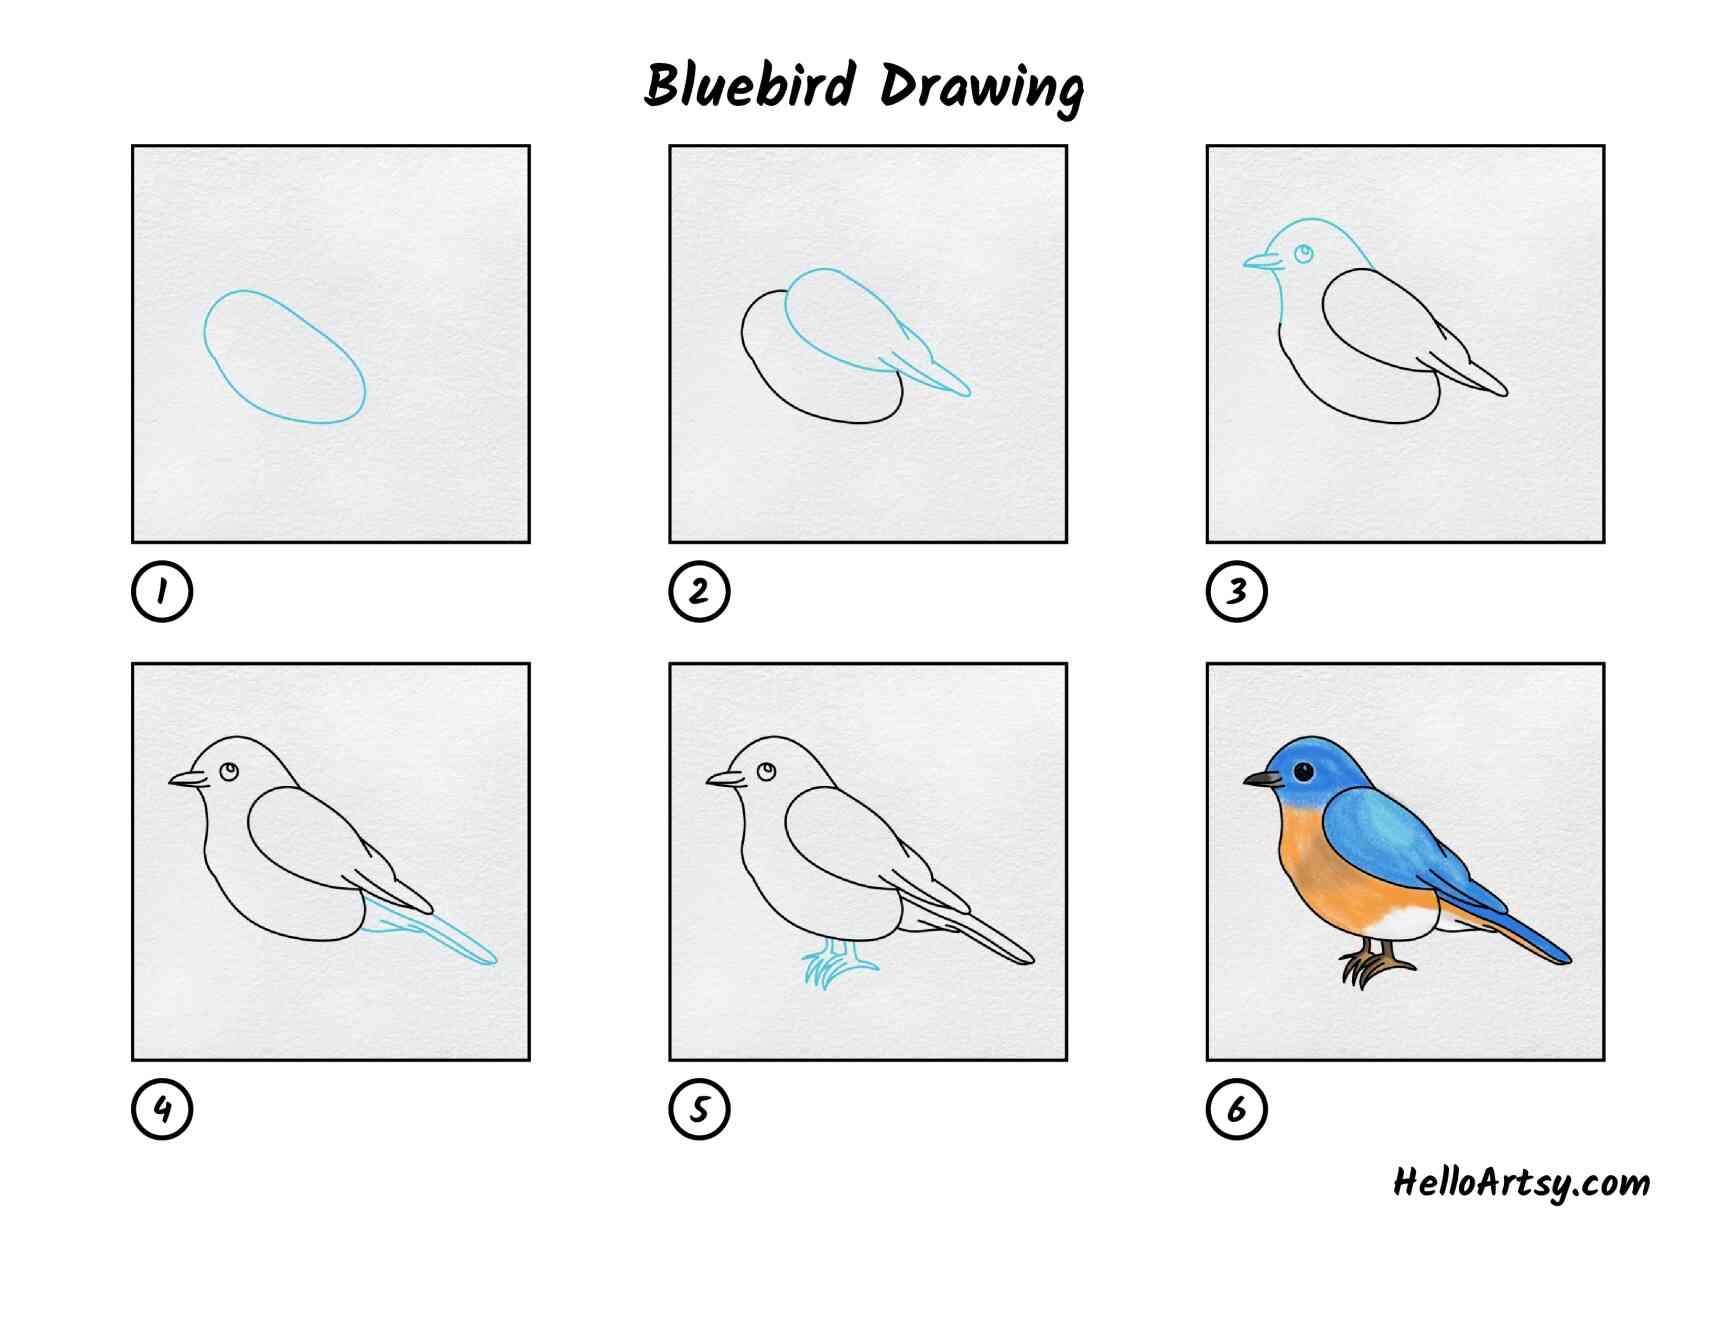 Bluebird Drawing: All Steps